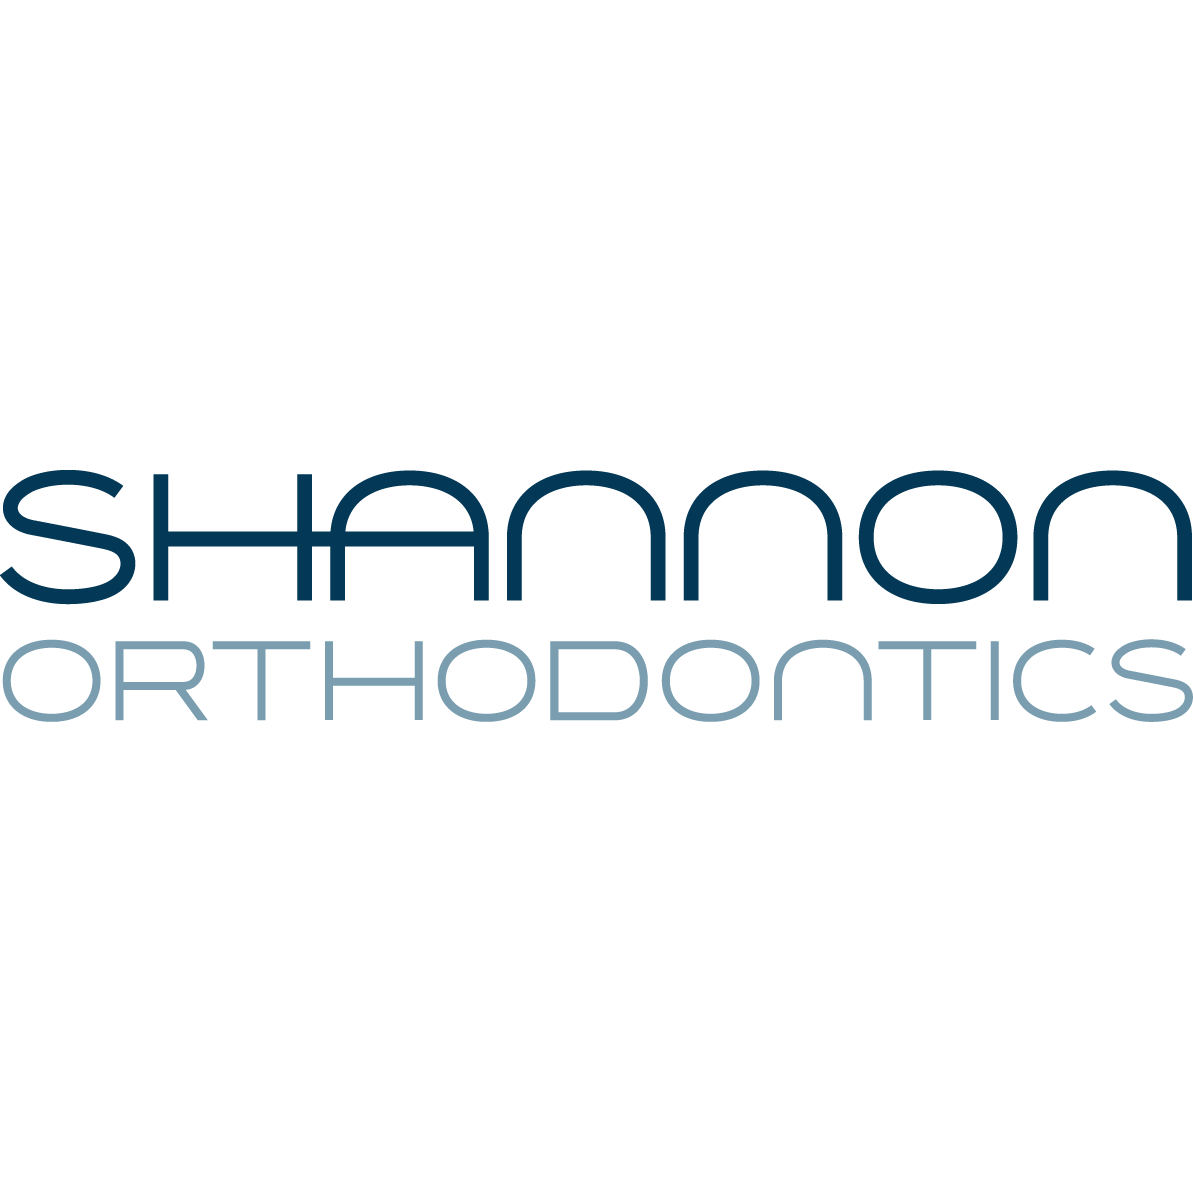 Shannon Orthodontics